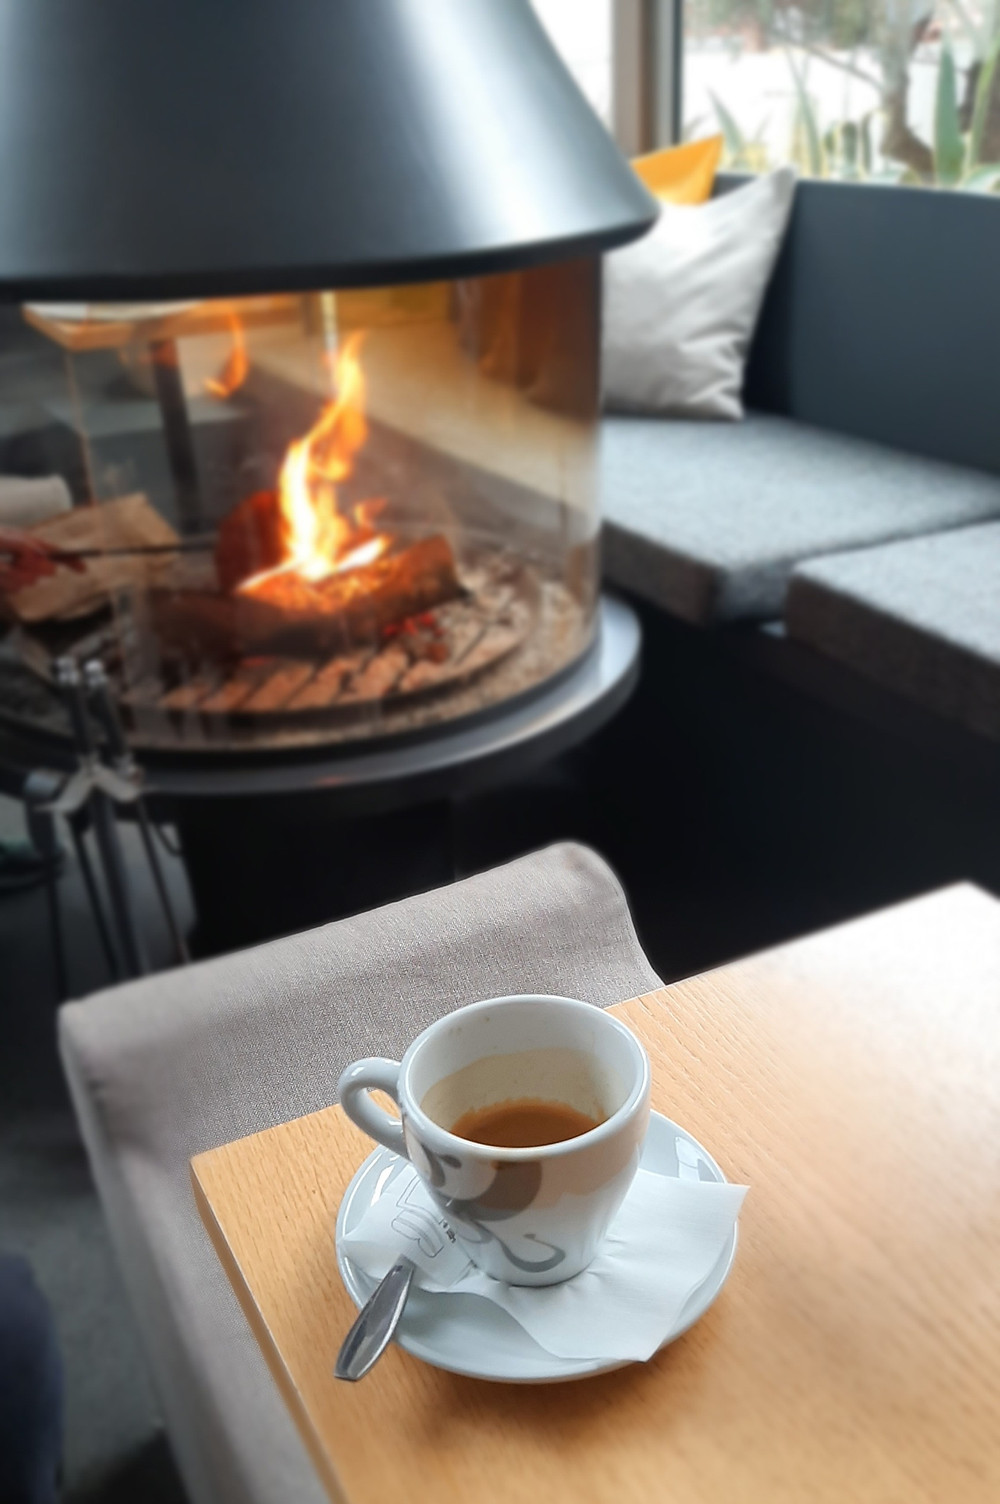 Coffee Seasons καφετέρια Νέας Μάκρης, καφες